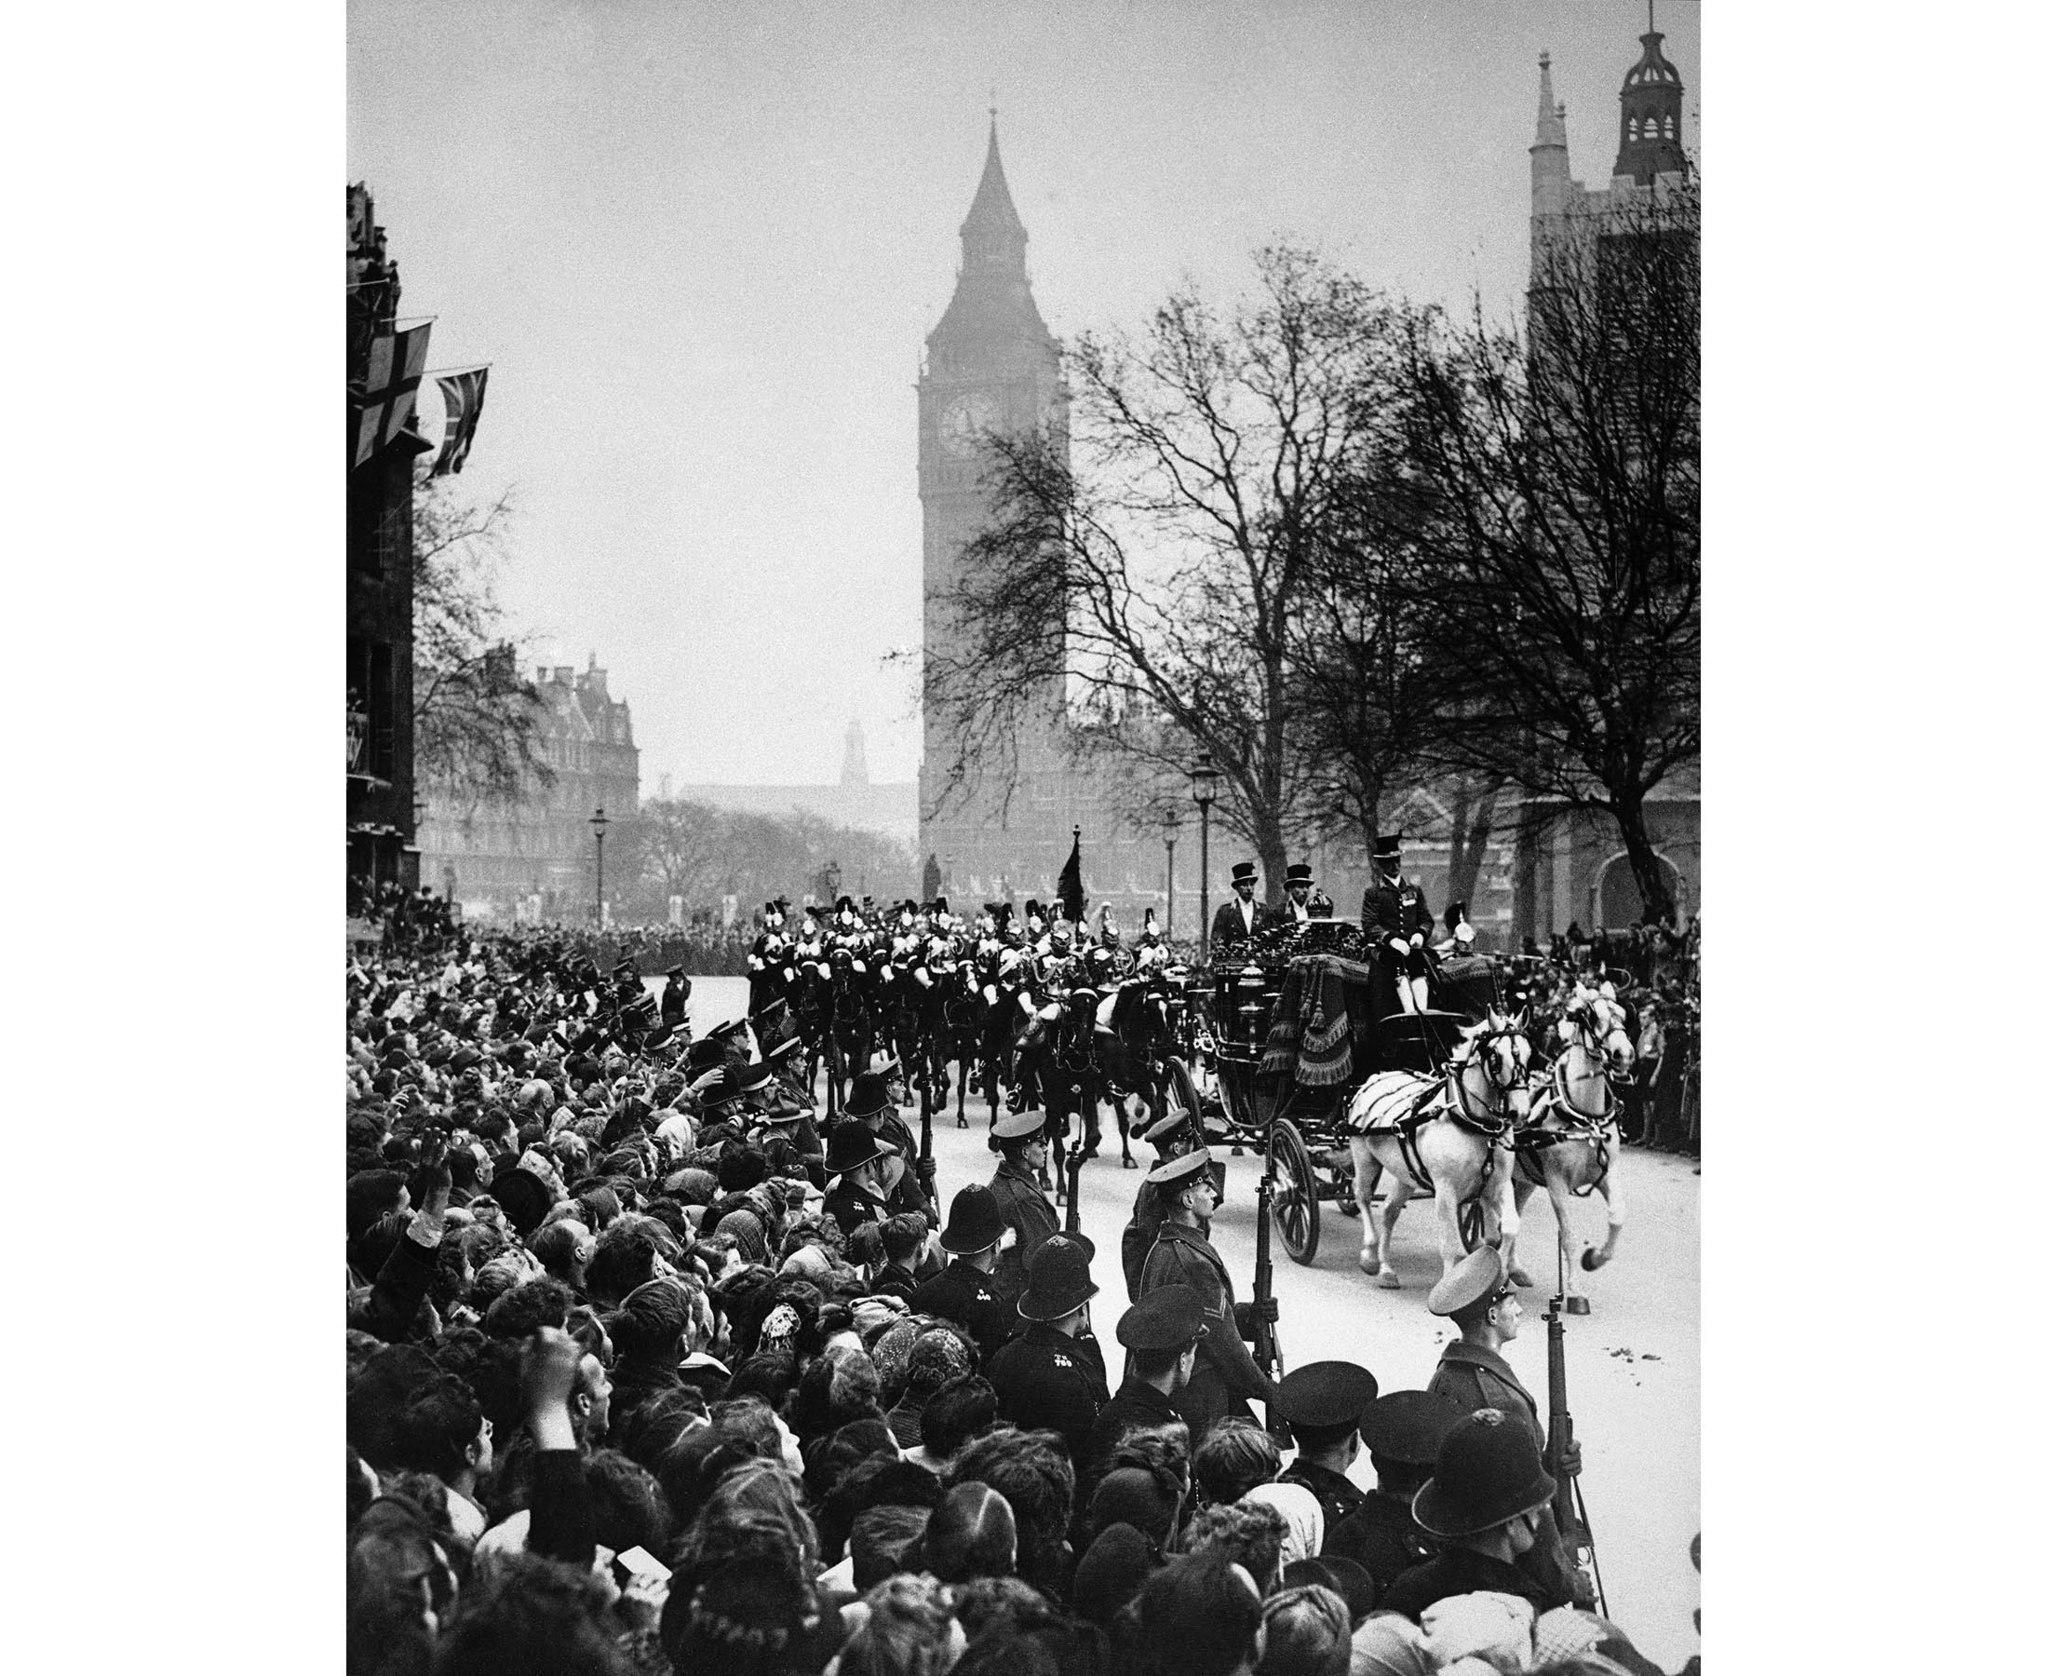 Bridal procession